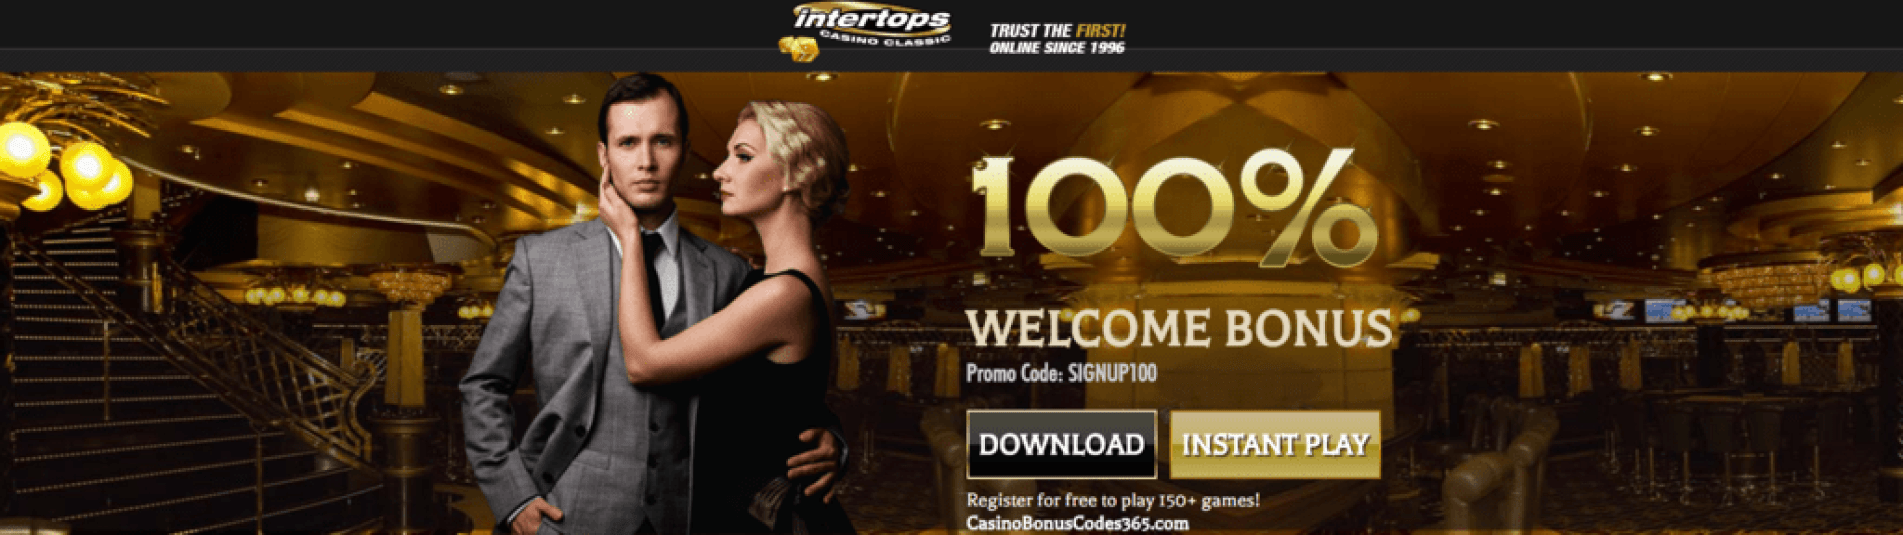 Intertops Casino Classic Sign Up Bonus 100% New Players